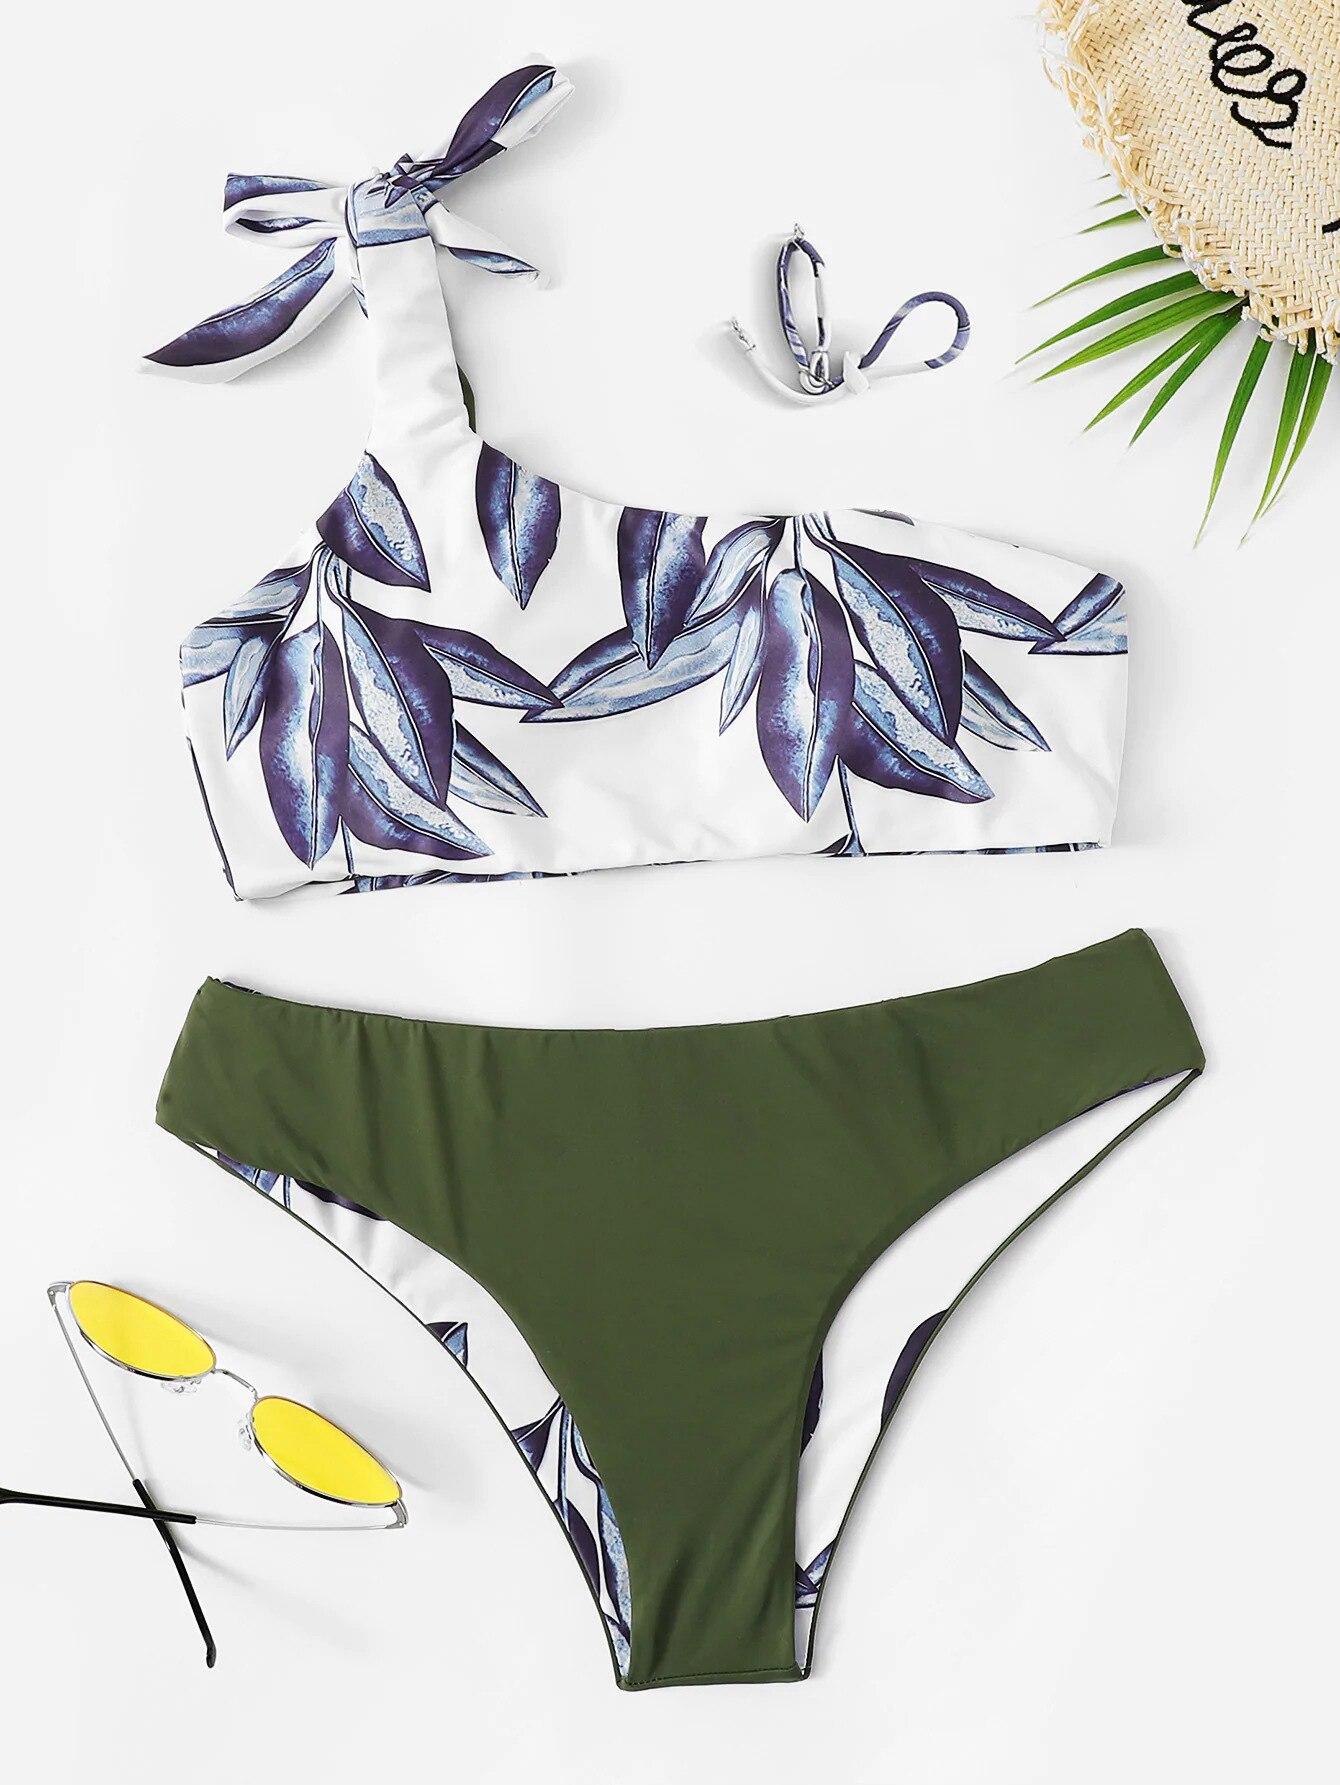 Leaf Print One Shoulder Bandeau Push Up Bikini Set Micro Bikinis Women Bowknot Swimwear Bandage Swimsuit Low Waist Bathing Suits